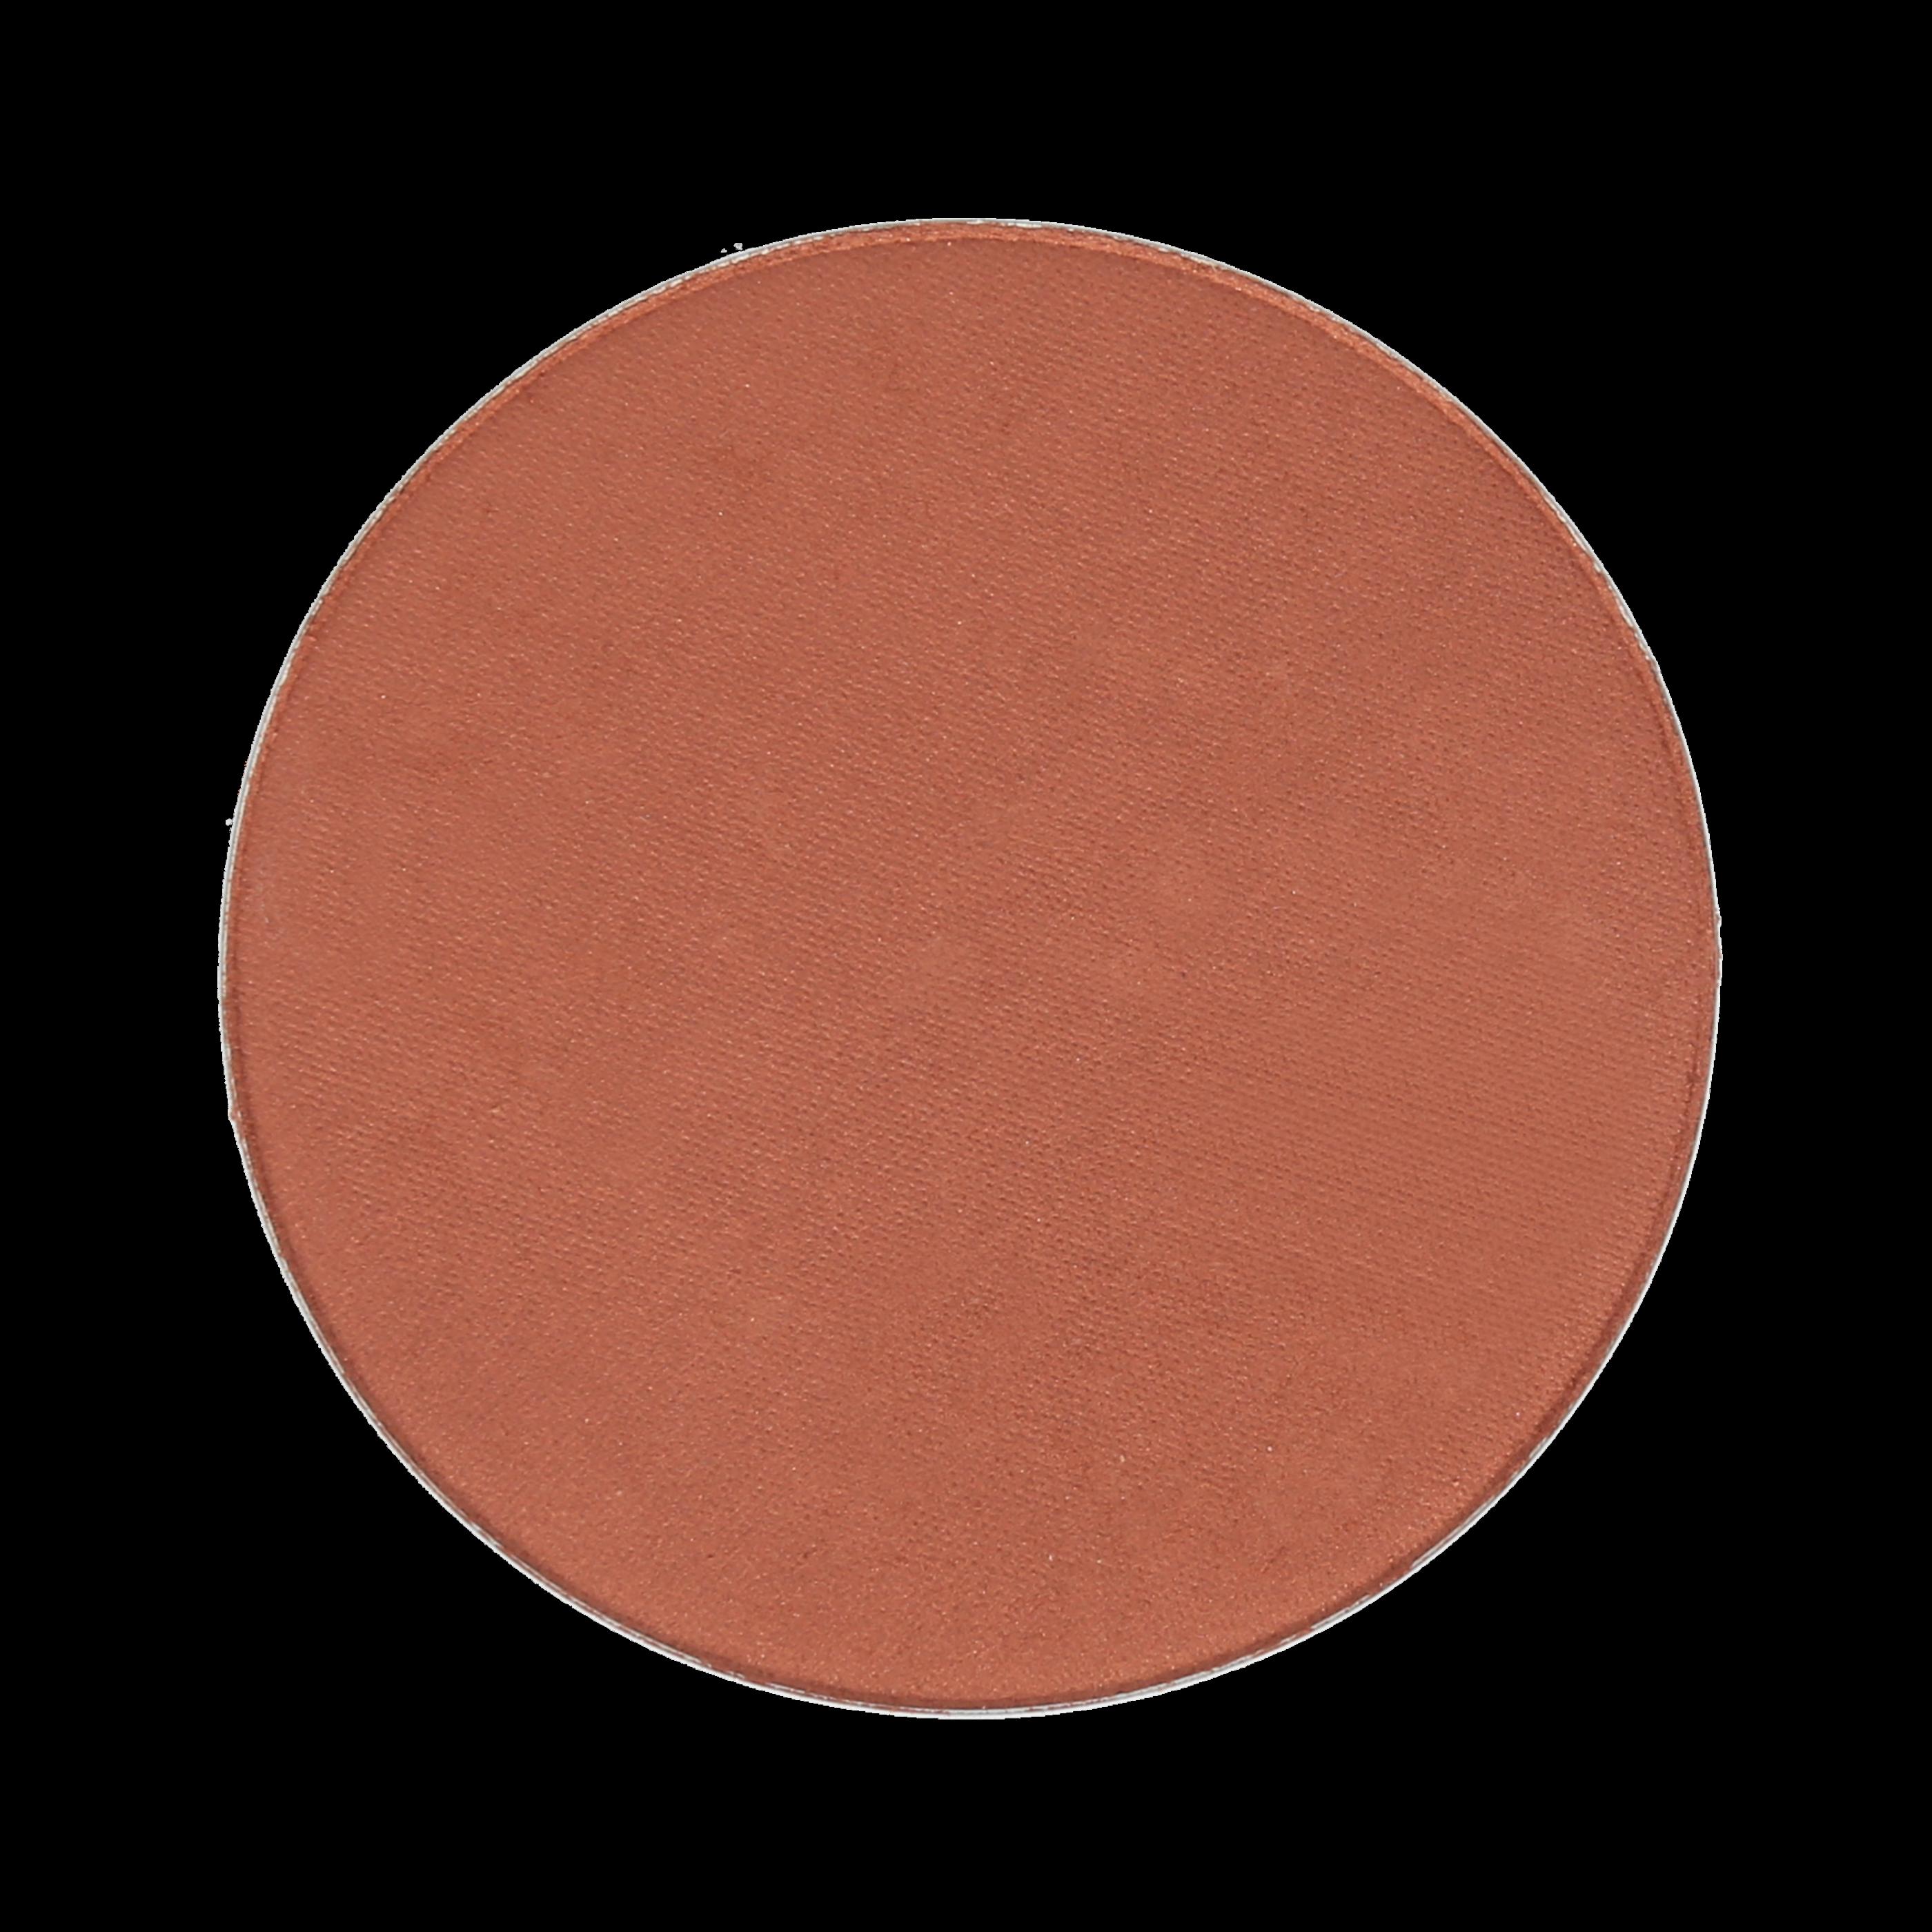 Bronzer Sunset Magnetic Refill